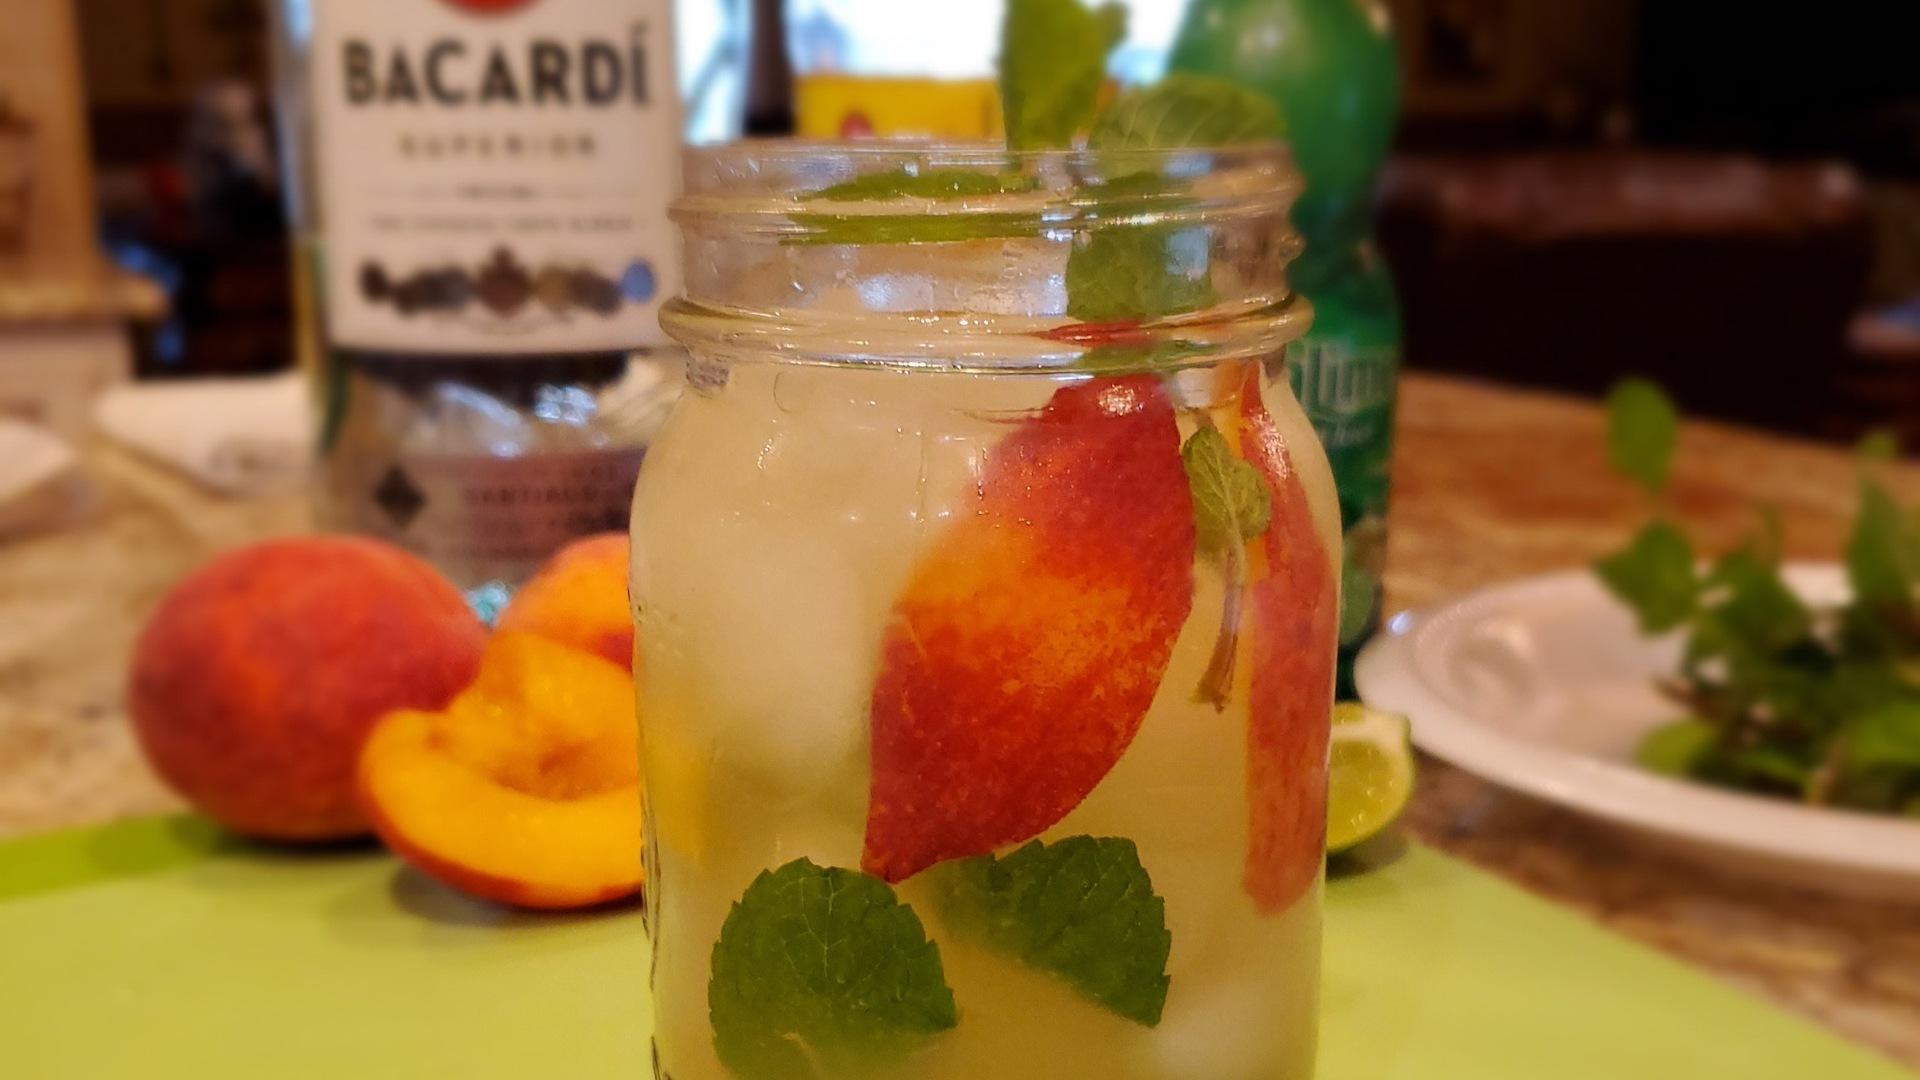 louisiana-peach-kingdude-mojito